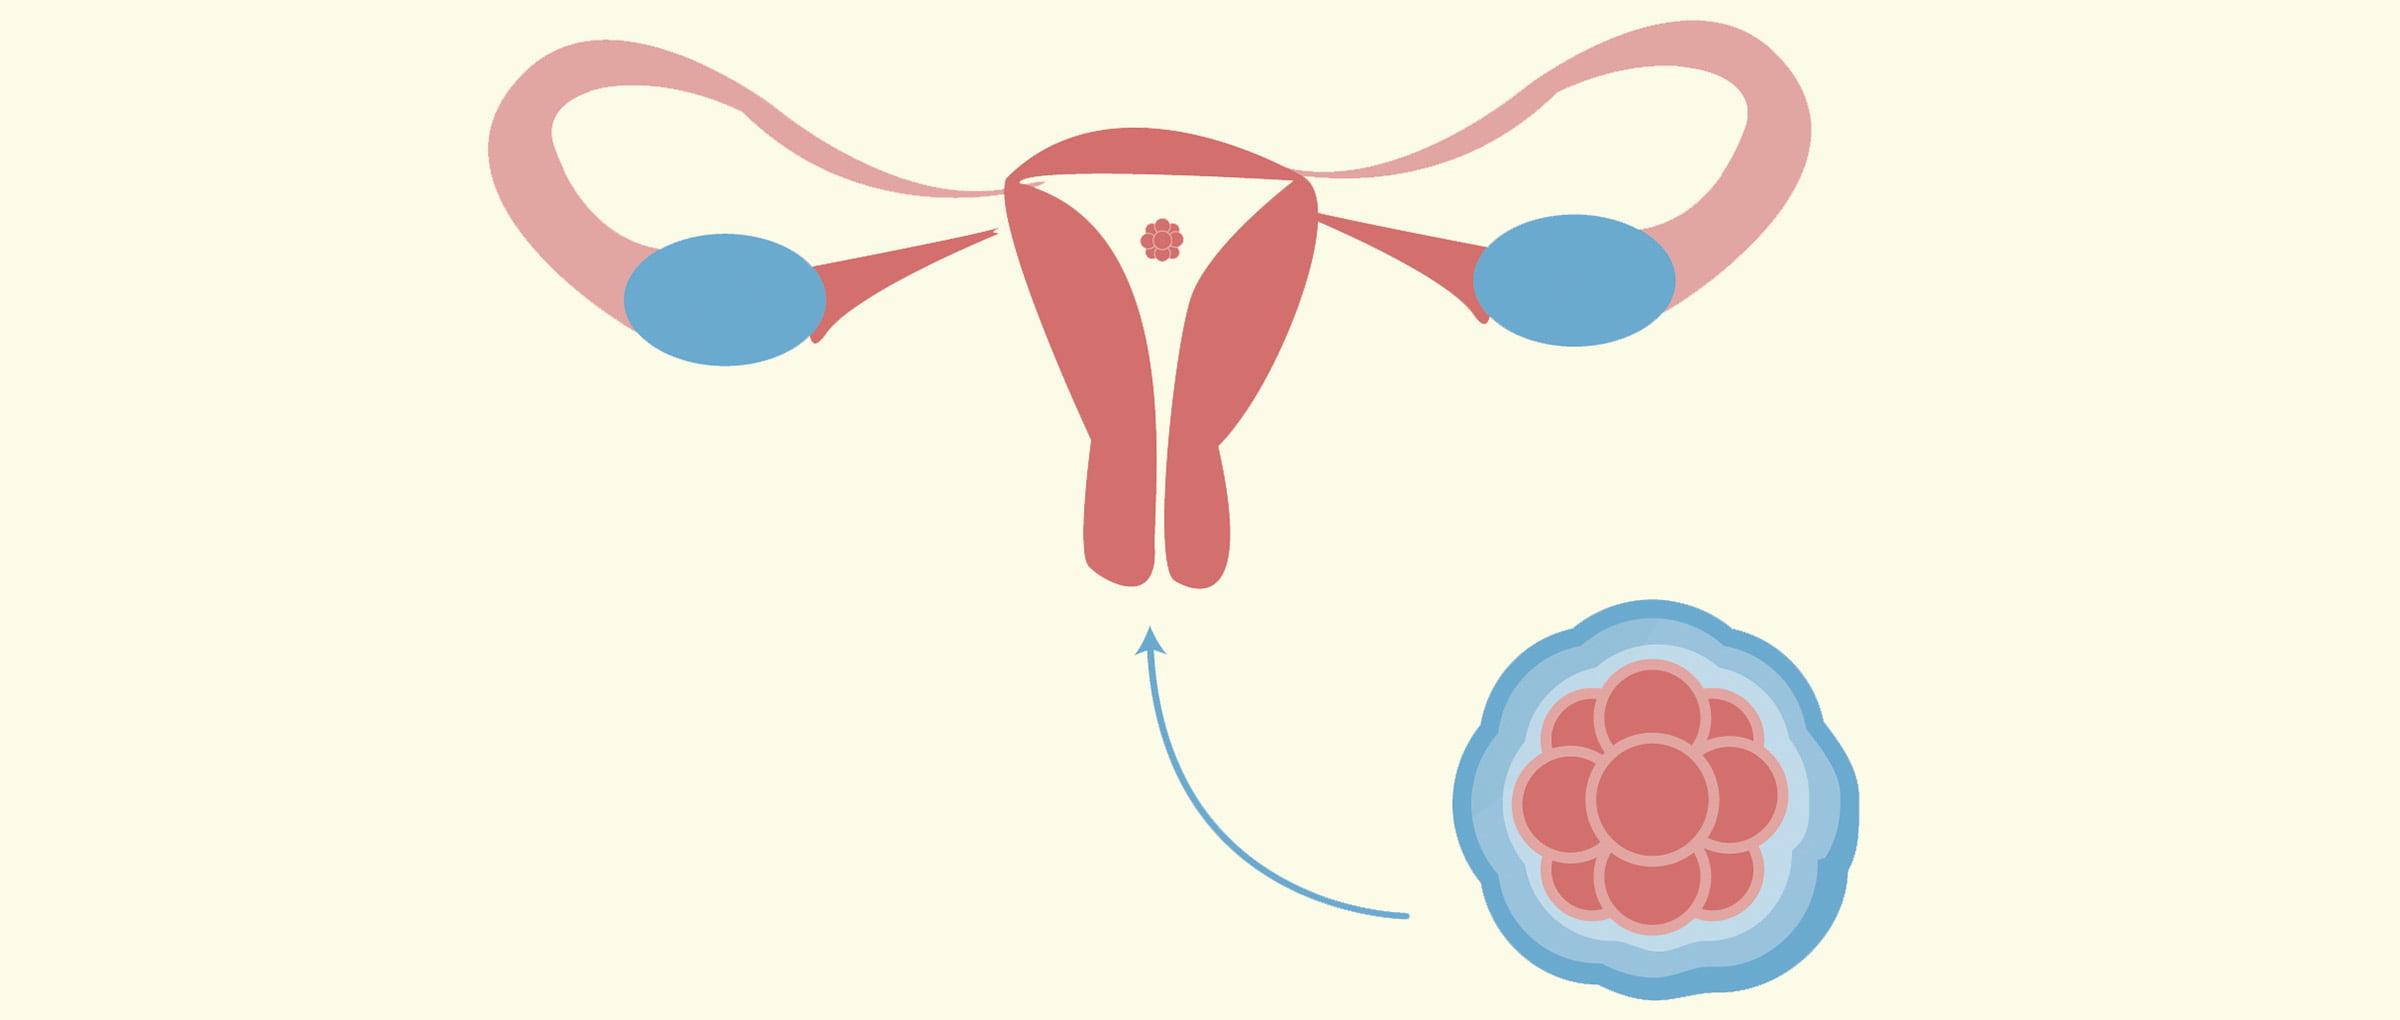 Embryo transfer to the uterus